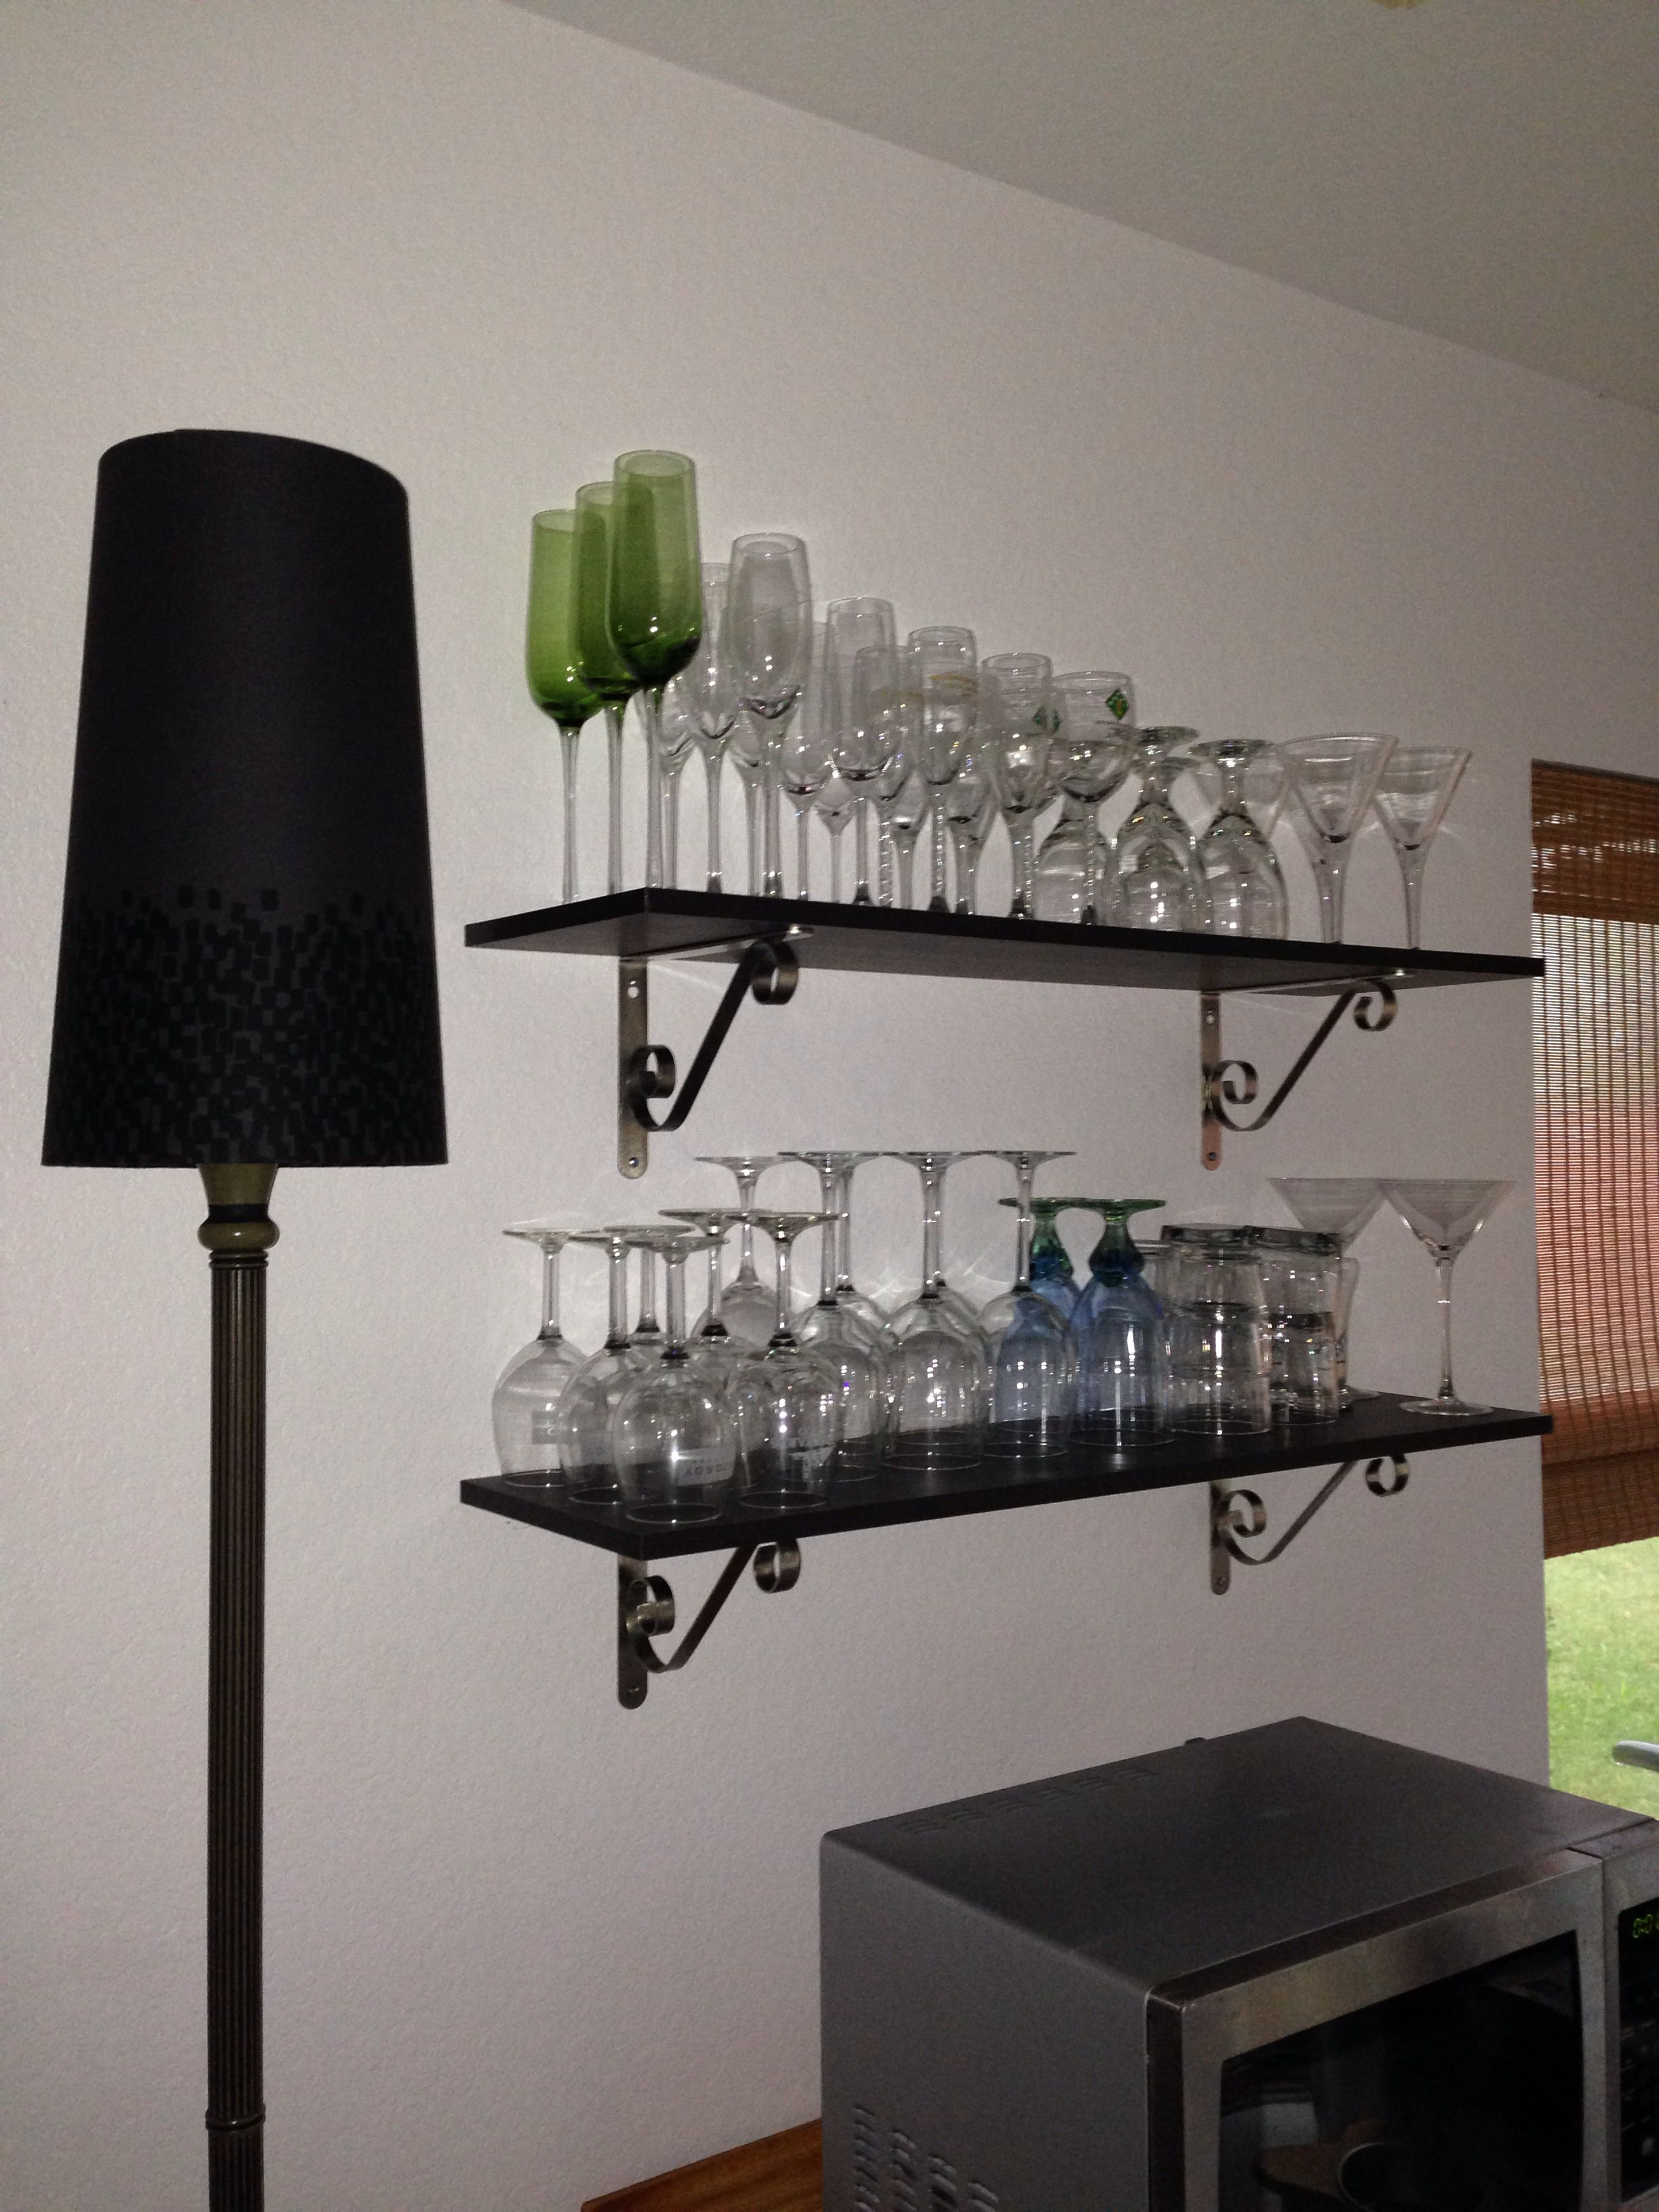 Diy wine glass shelves future kitchen remodel pinterest